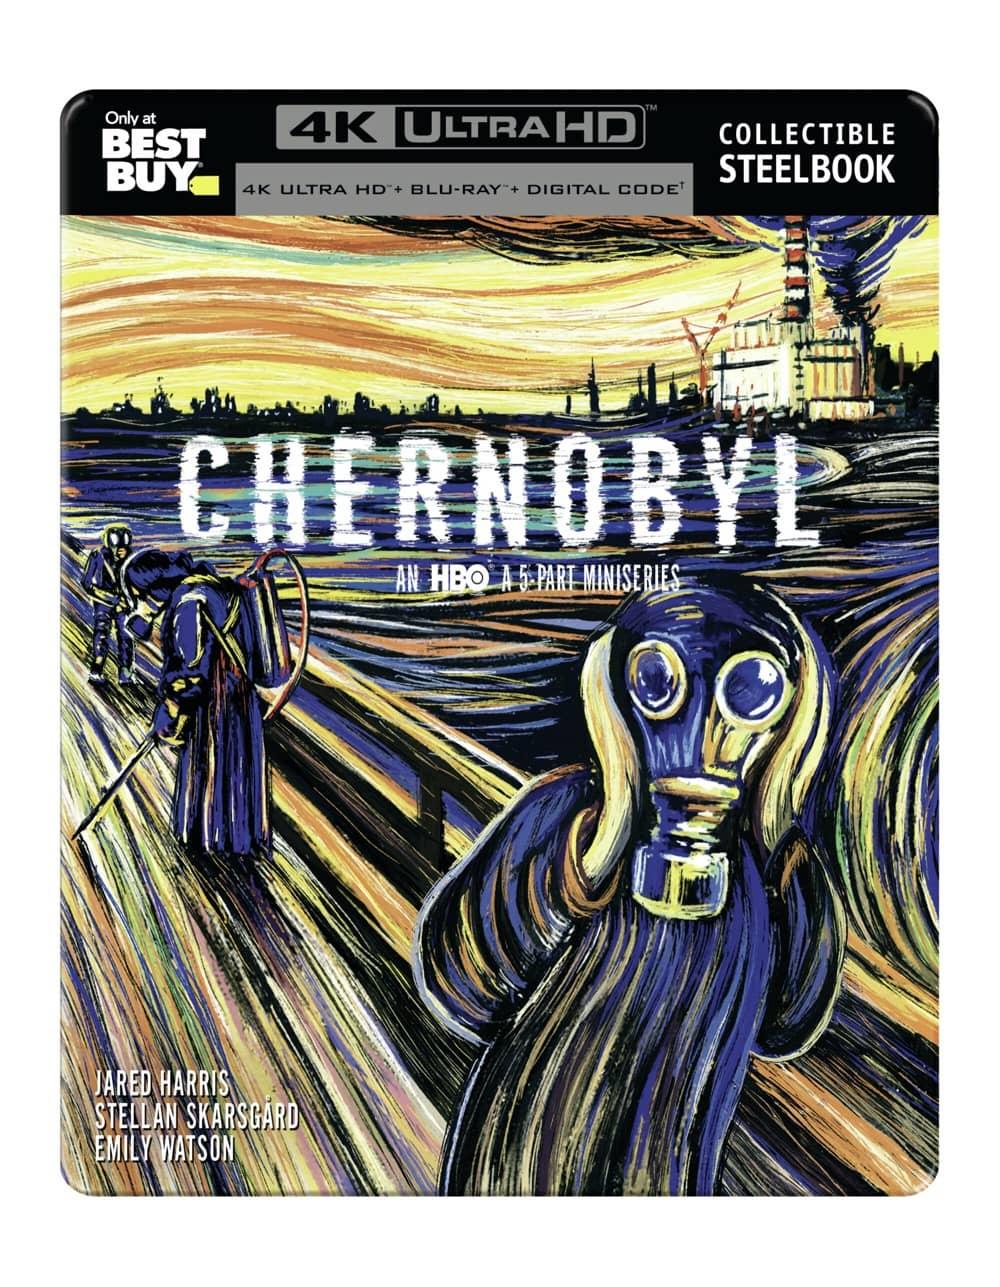 CHERNOBYL 4K UHD BBY Steelbook 2